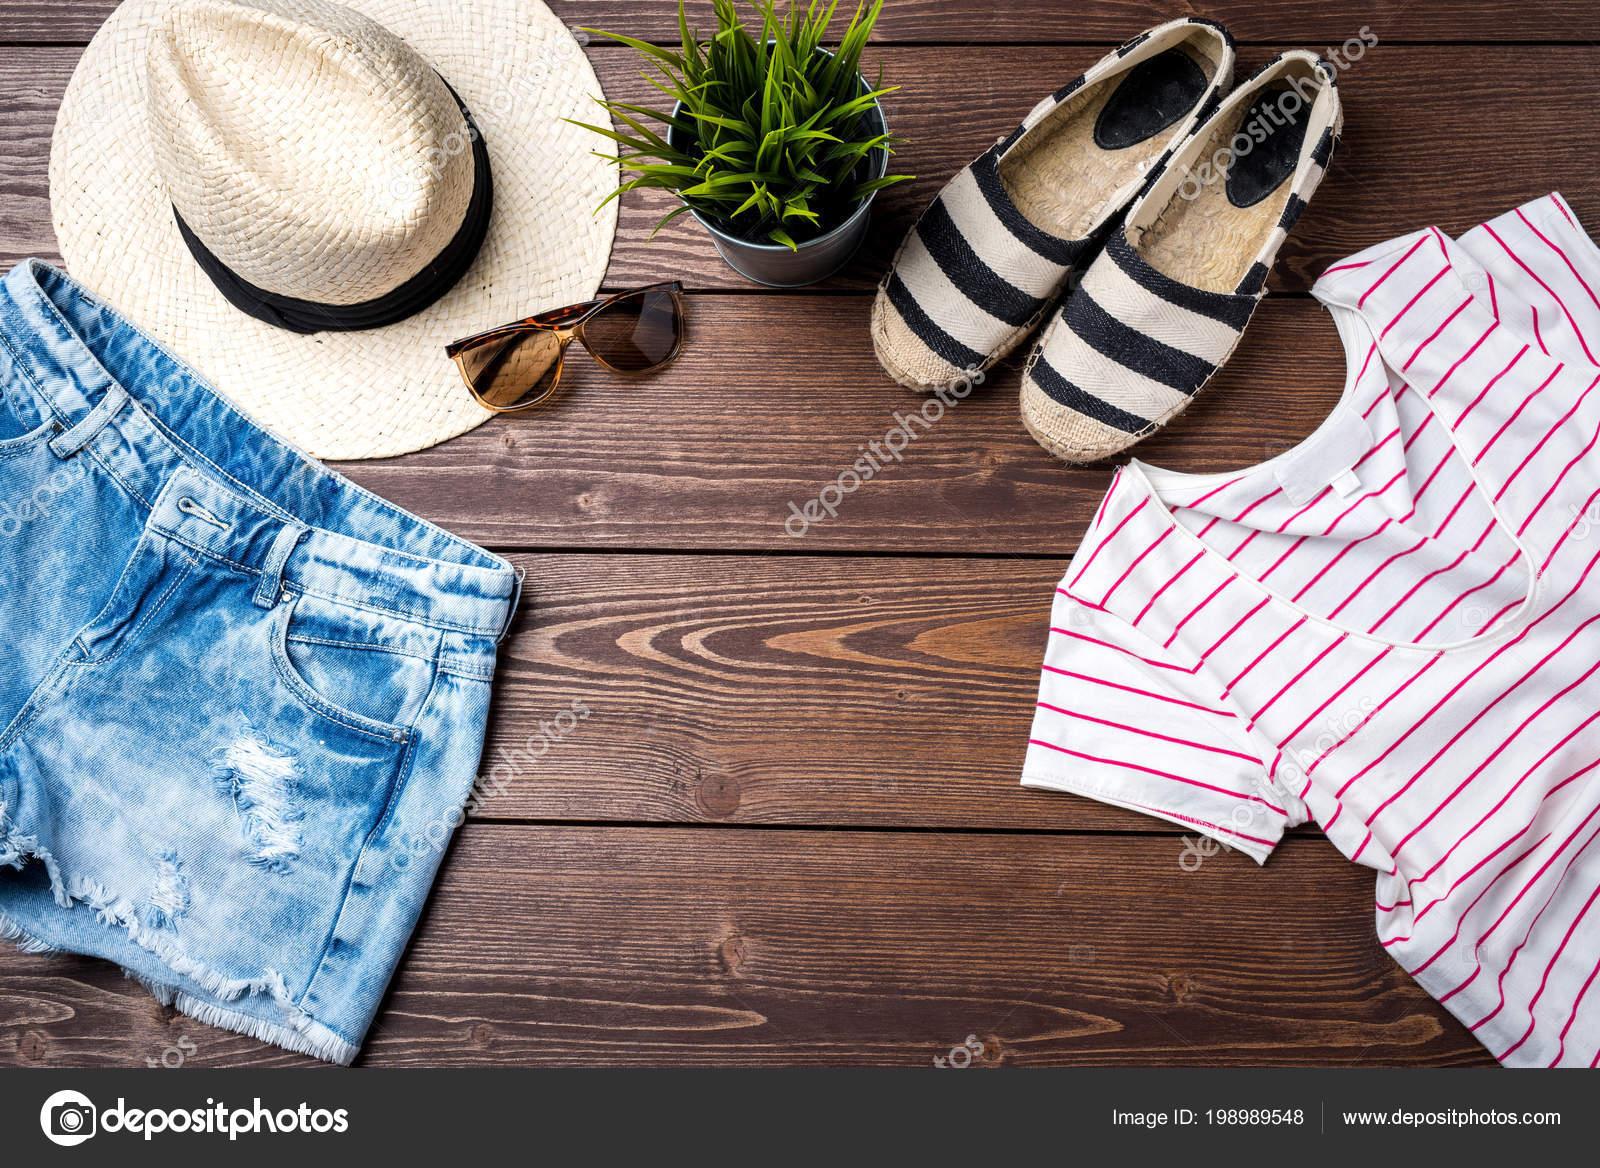 9265885f74c7 Casual Γυναικεία Ρούχα Ξύλινο Υπόβαθρο Top View — Φωτογραφία Αρχείου ...